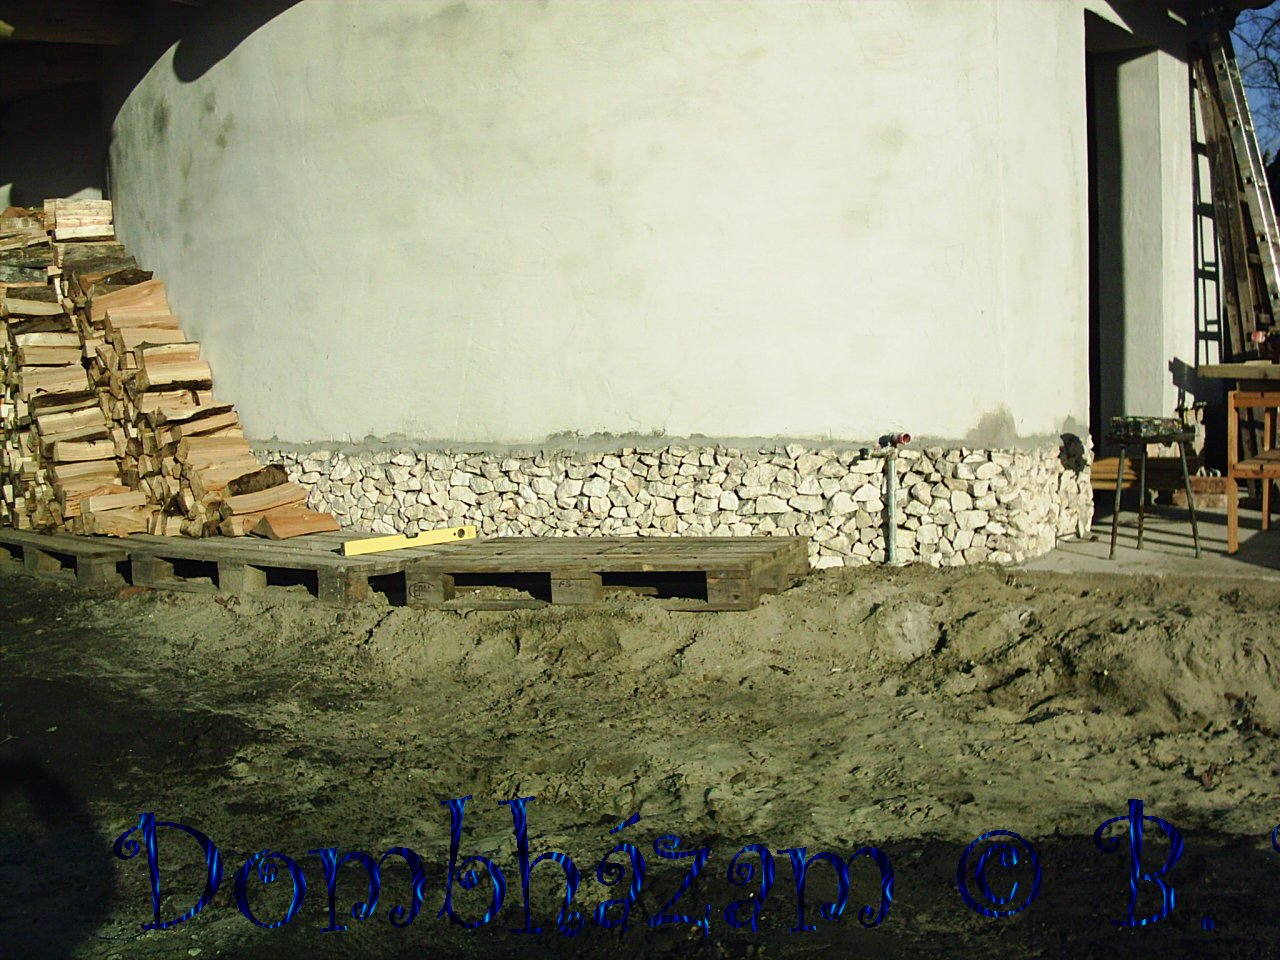 2008_12_23-09h_12m_09s.JPG